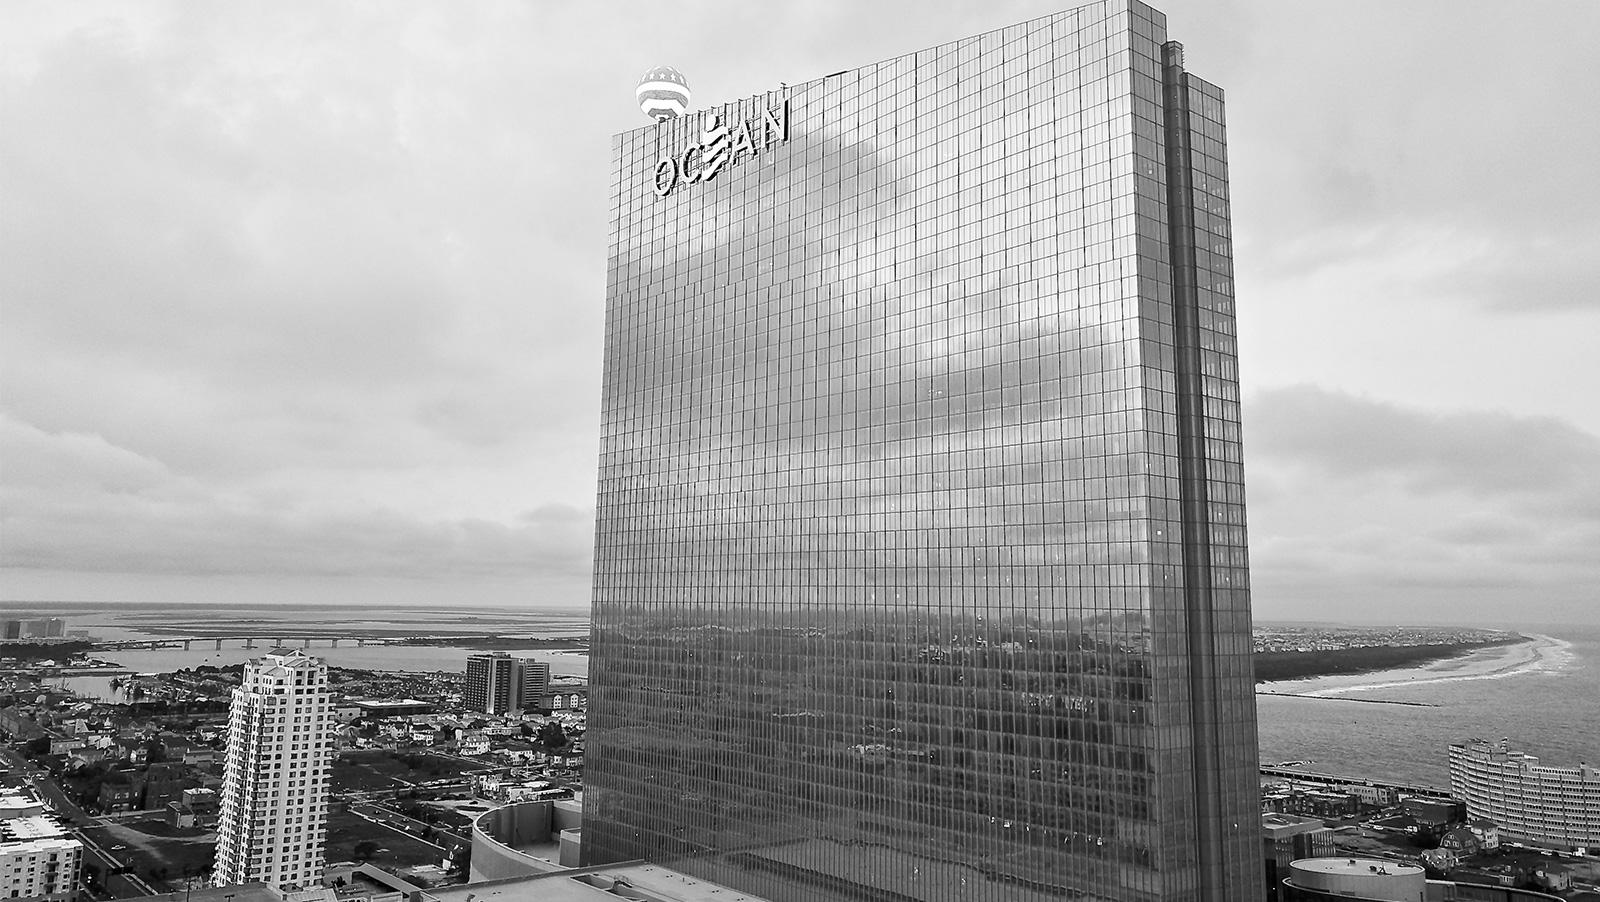 Ocean Casino Resort in Atlantic City to be run by Luxor